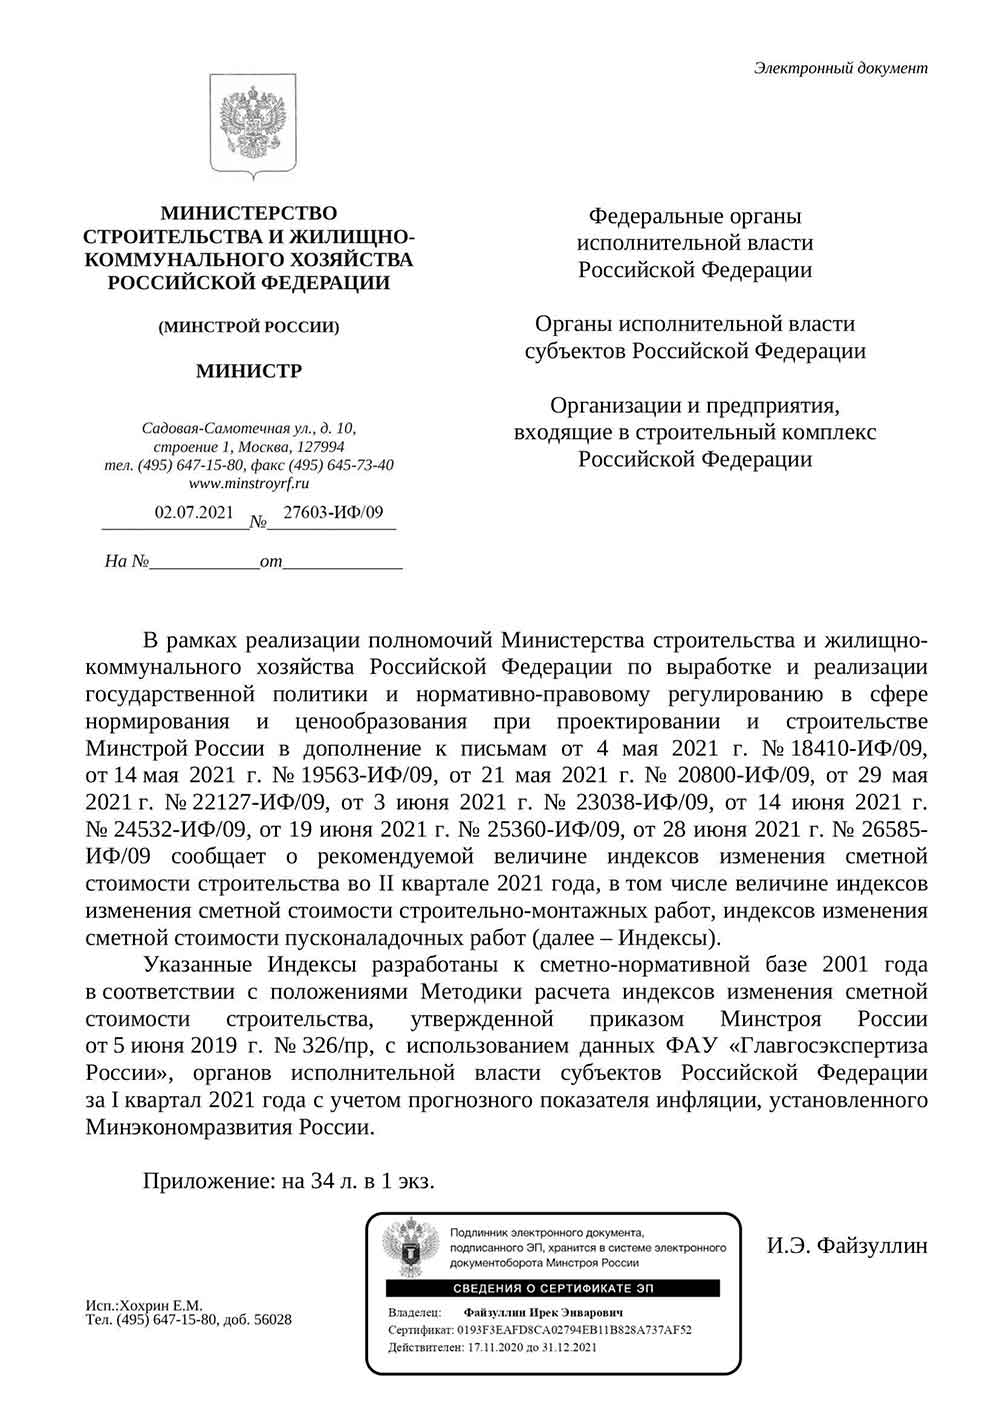 Письмо Минстроя РФ №27603-ИФ/09 от 02.07.2021 г.